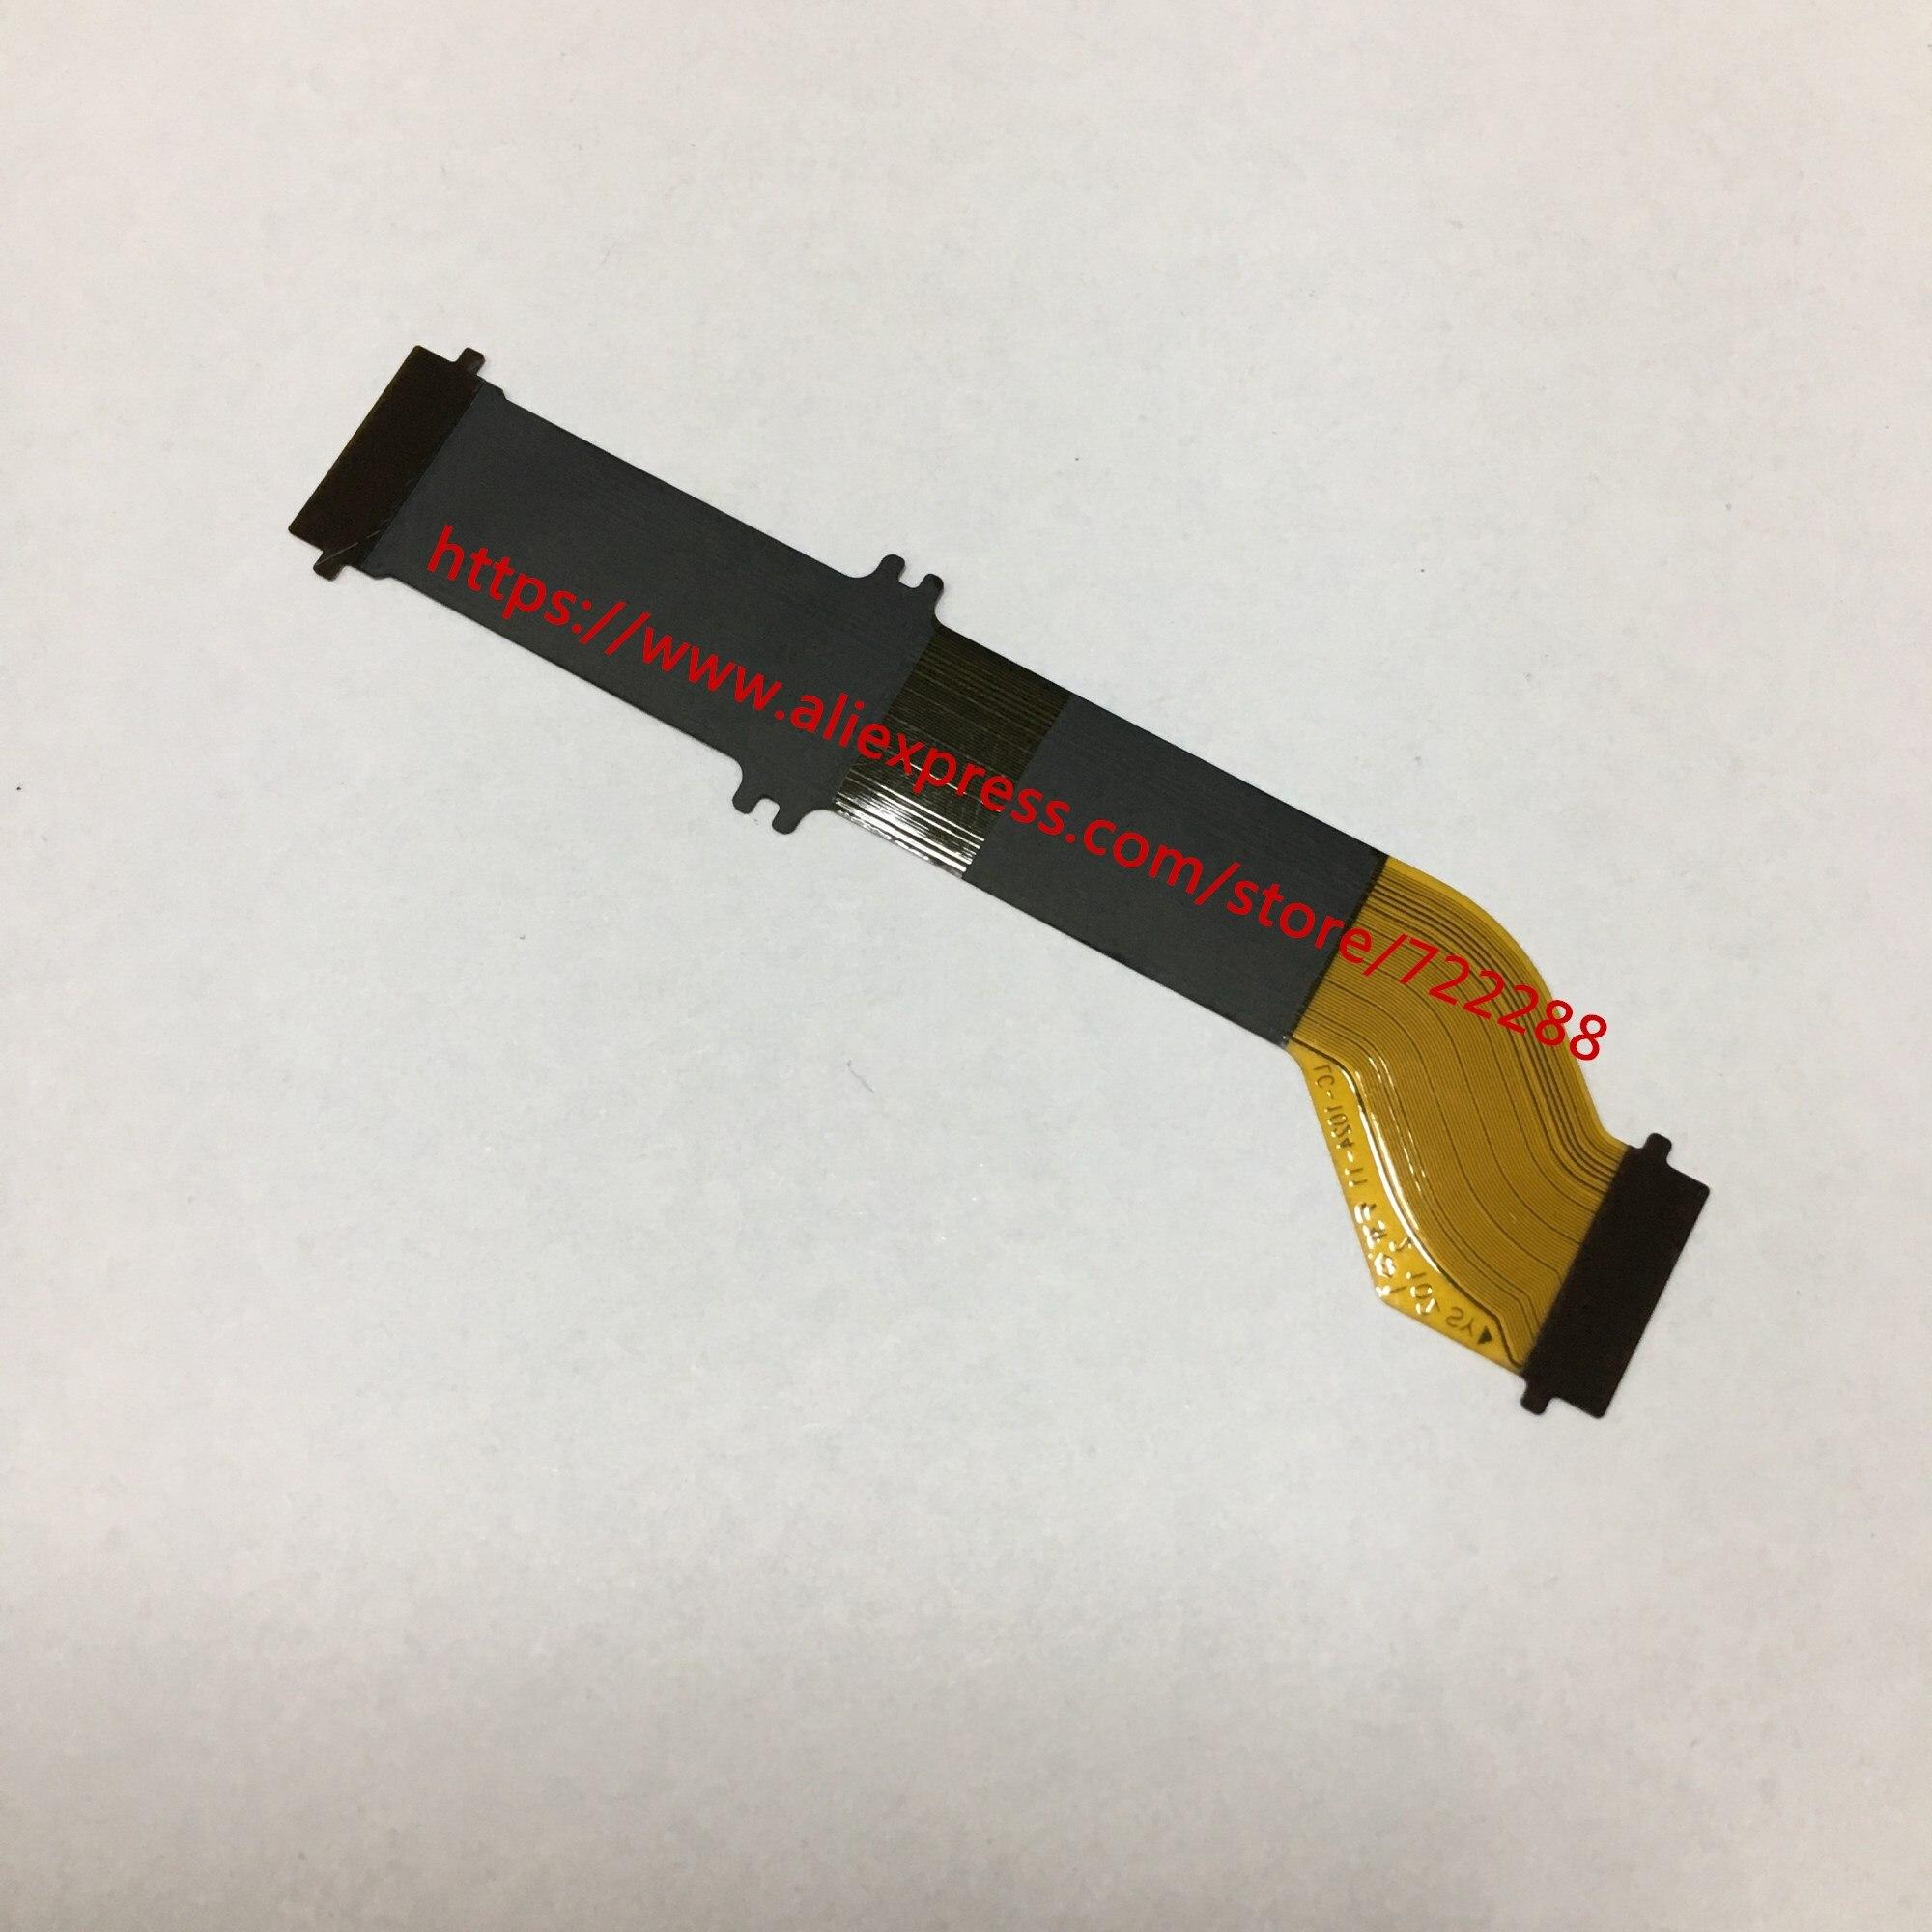 Piezas de reparación para Sony A7M2 A7 II ILCE-7M2 ILCE-7 II LCD pantalla Flex Cable de conexión FPC